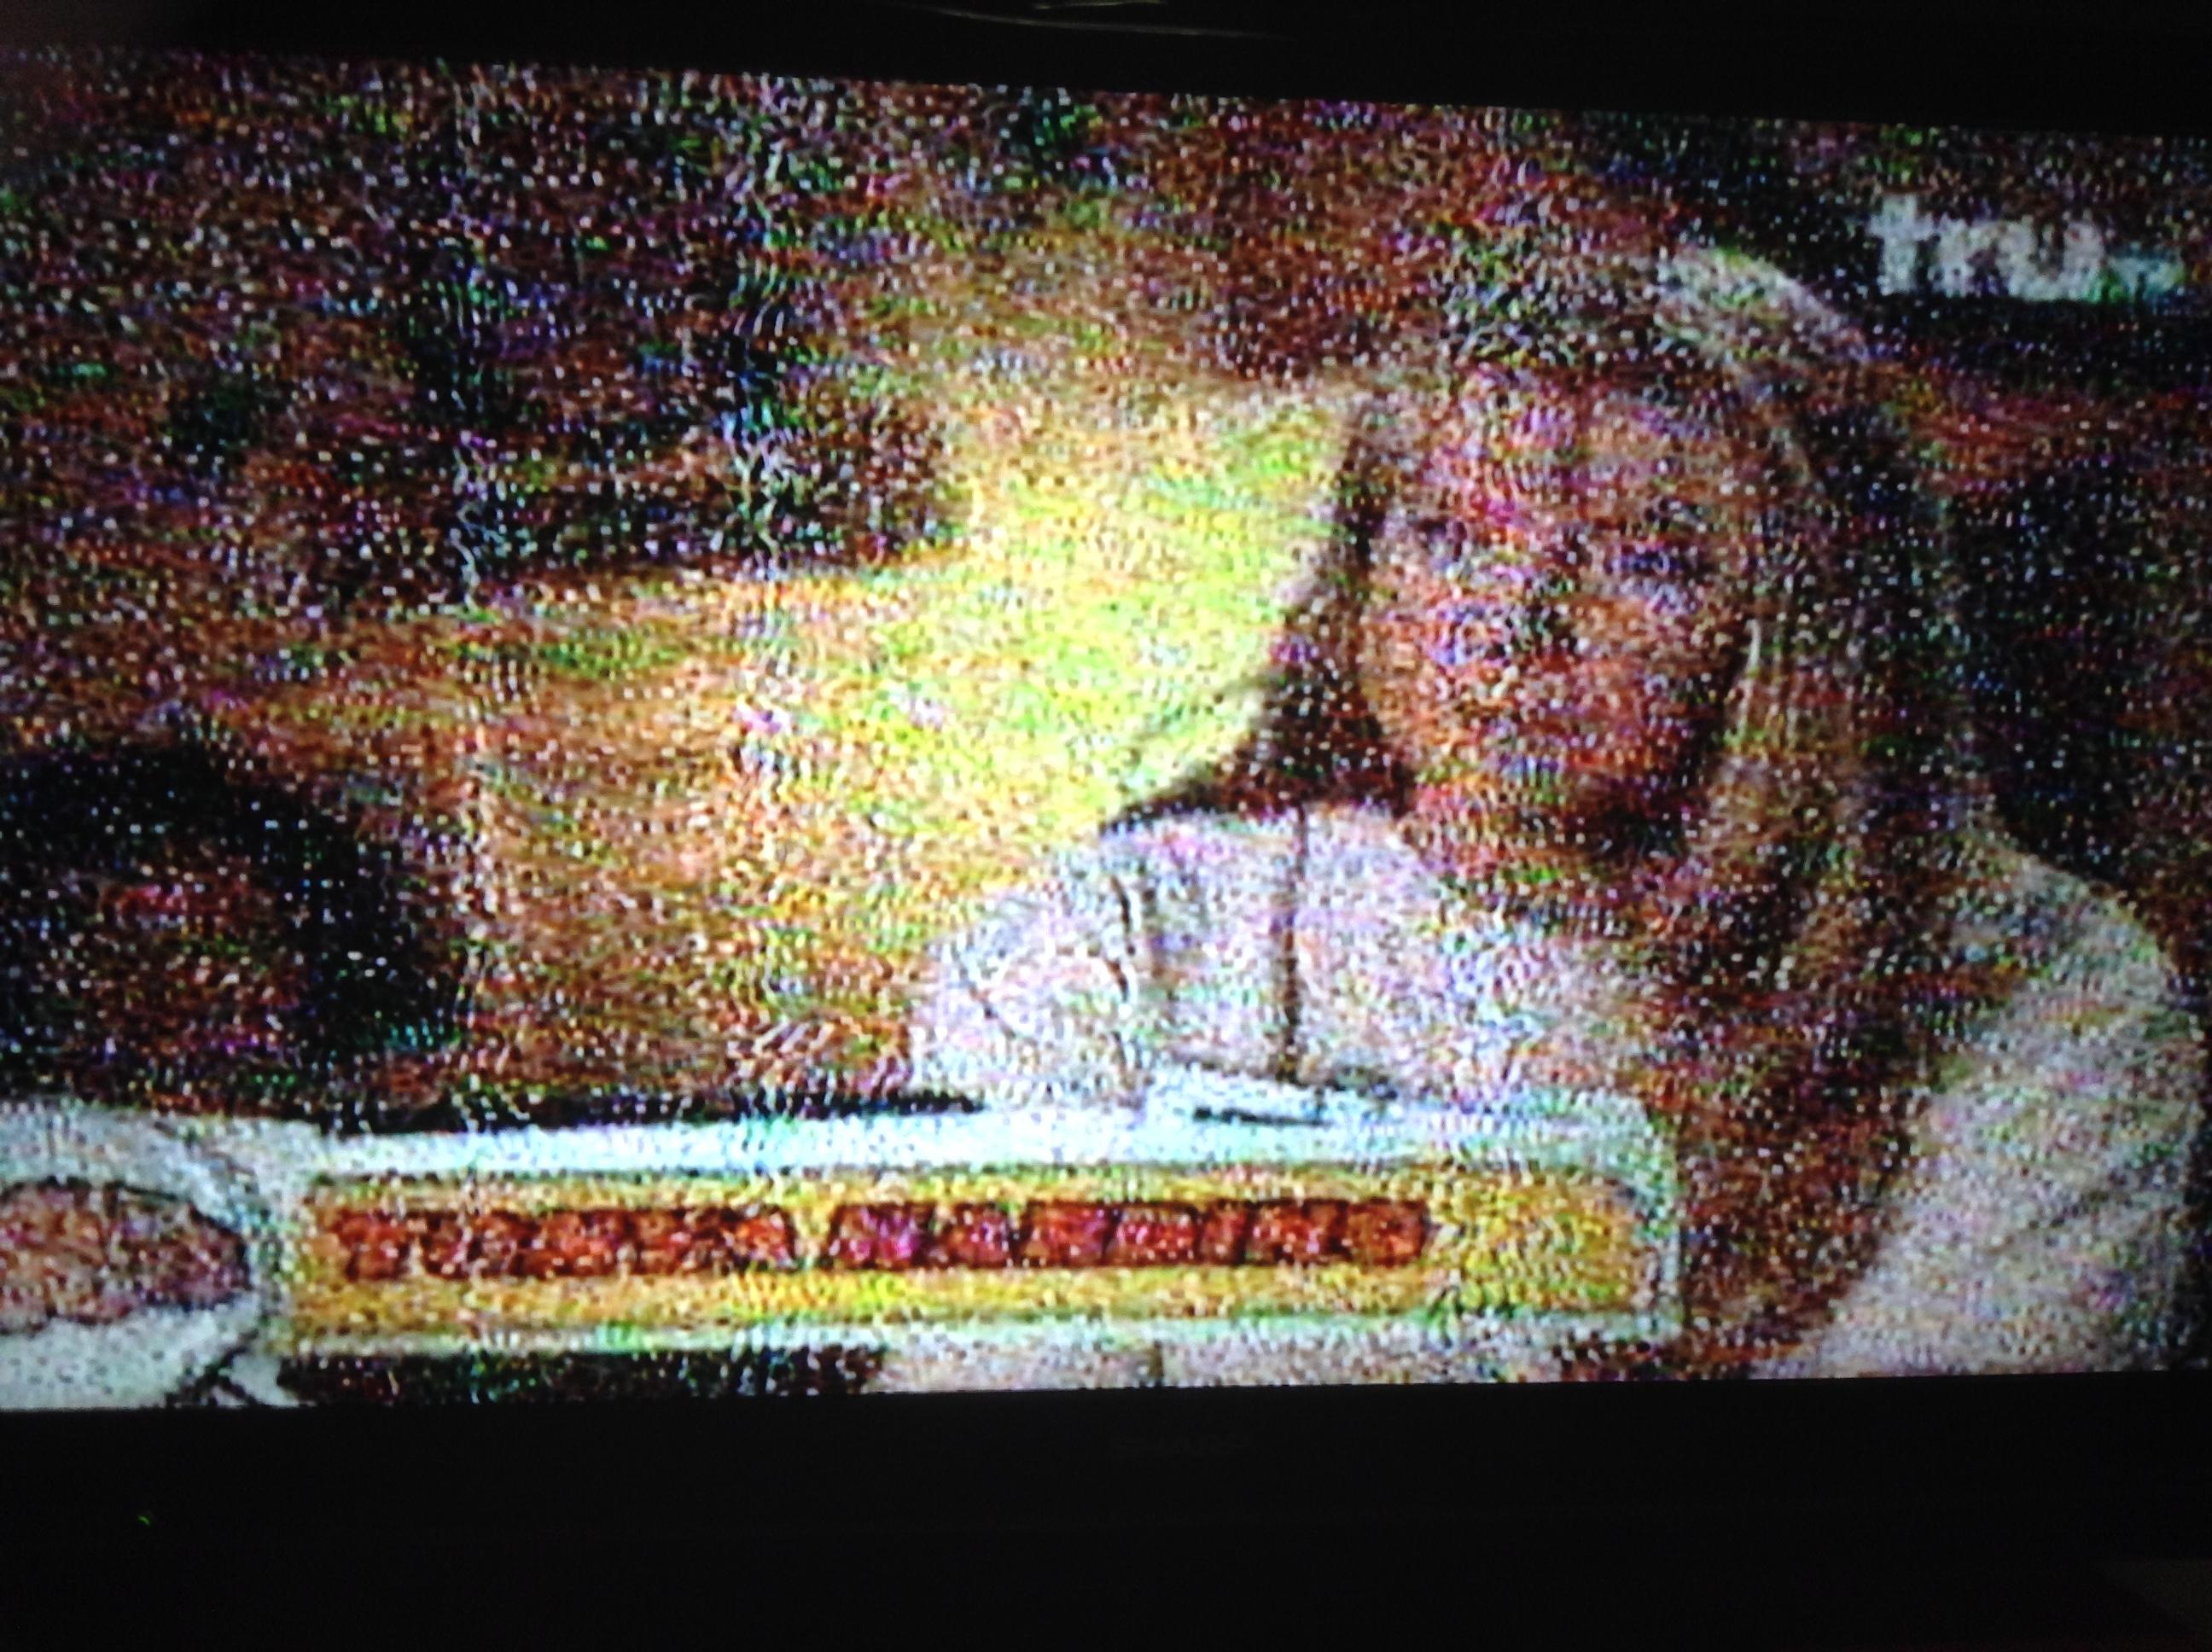 Worlds Dumbest images Tonya Harding in Criminals 18 HD 2592x1936